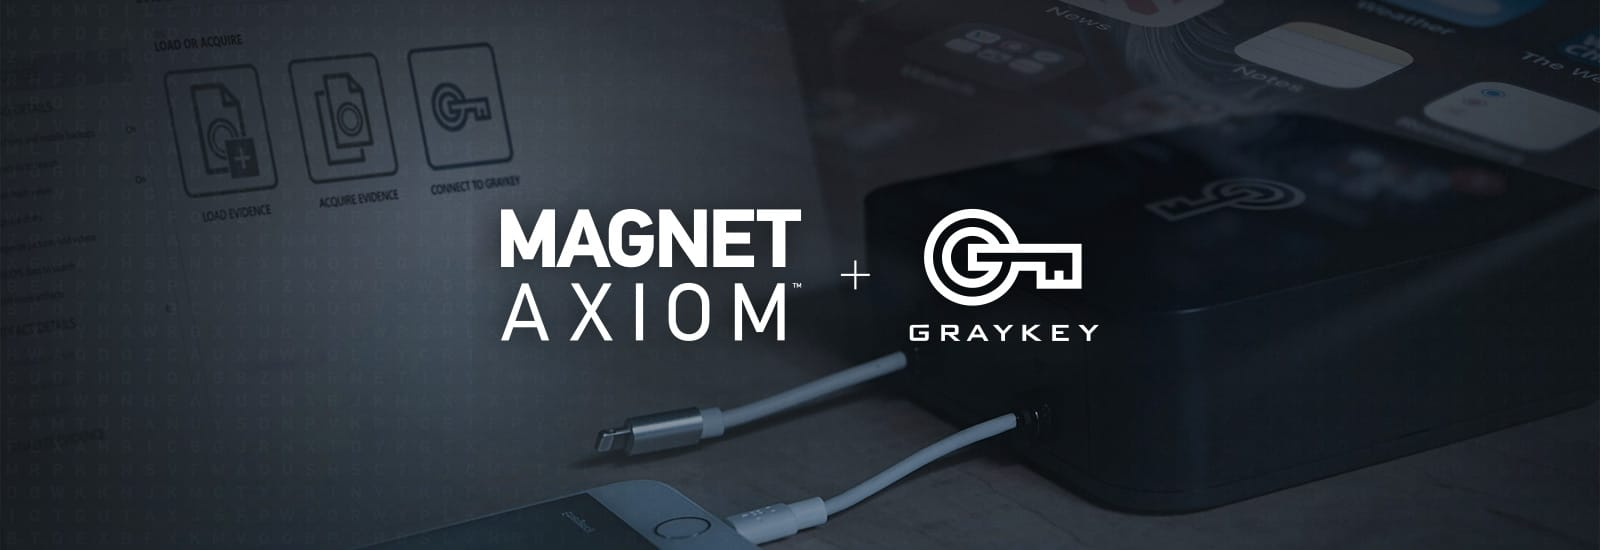 AXIOM + GrayKey